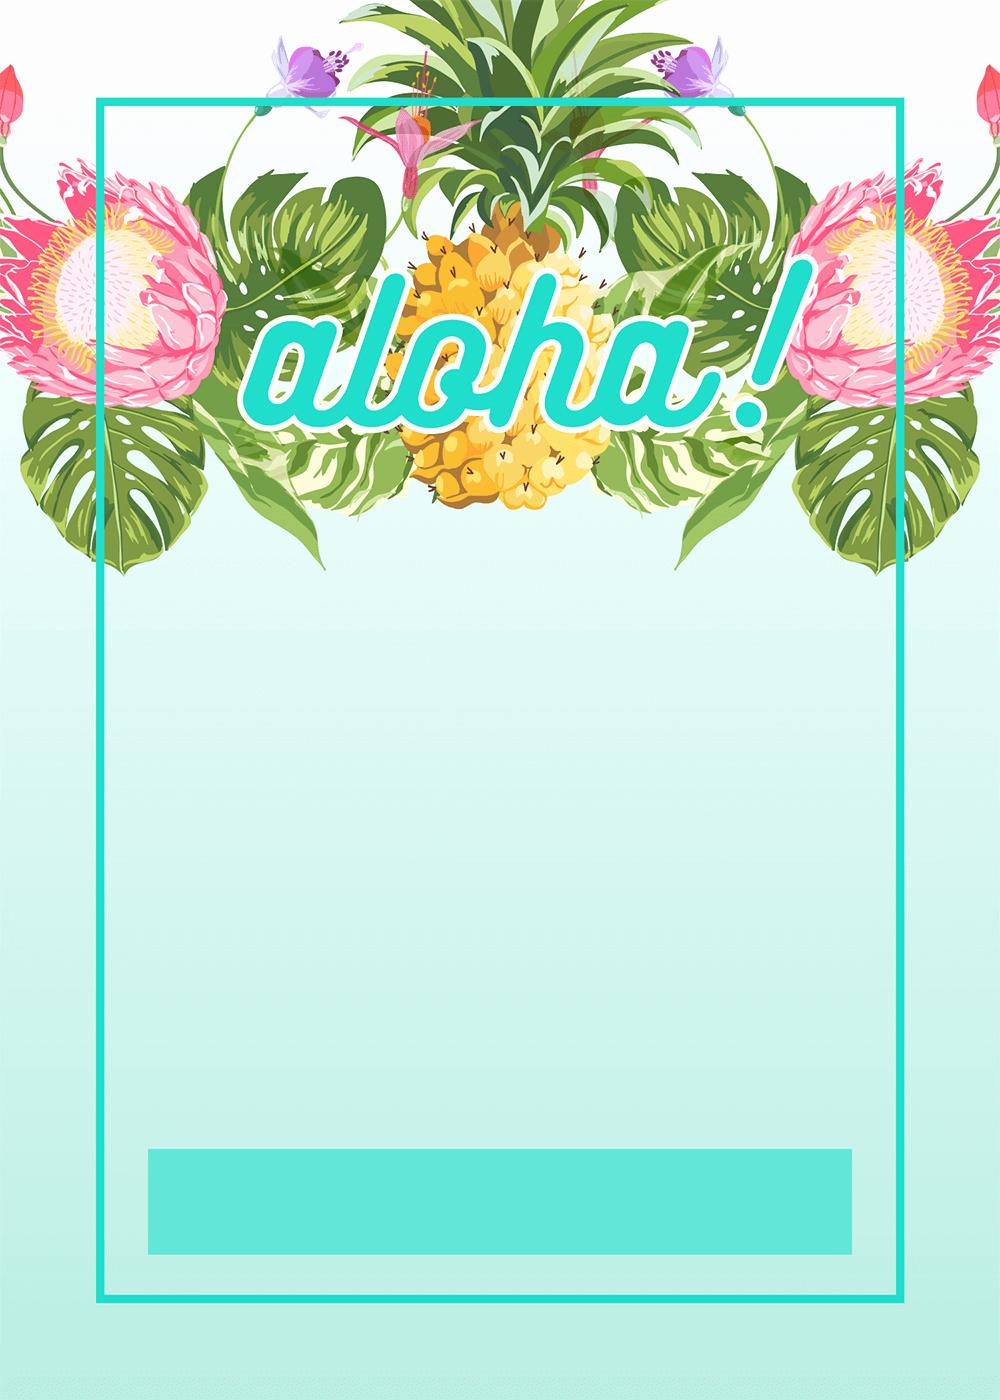 Hawaiian theme Party Invitations Printable Awesome Pineapple Luau Perimeter Free Printable Birthday